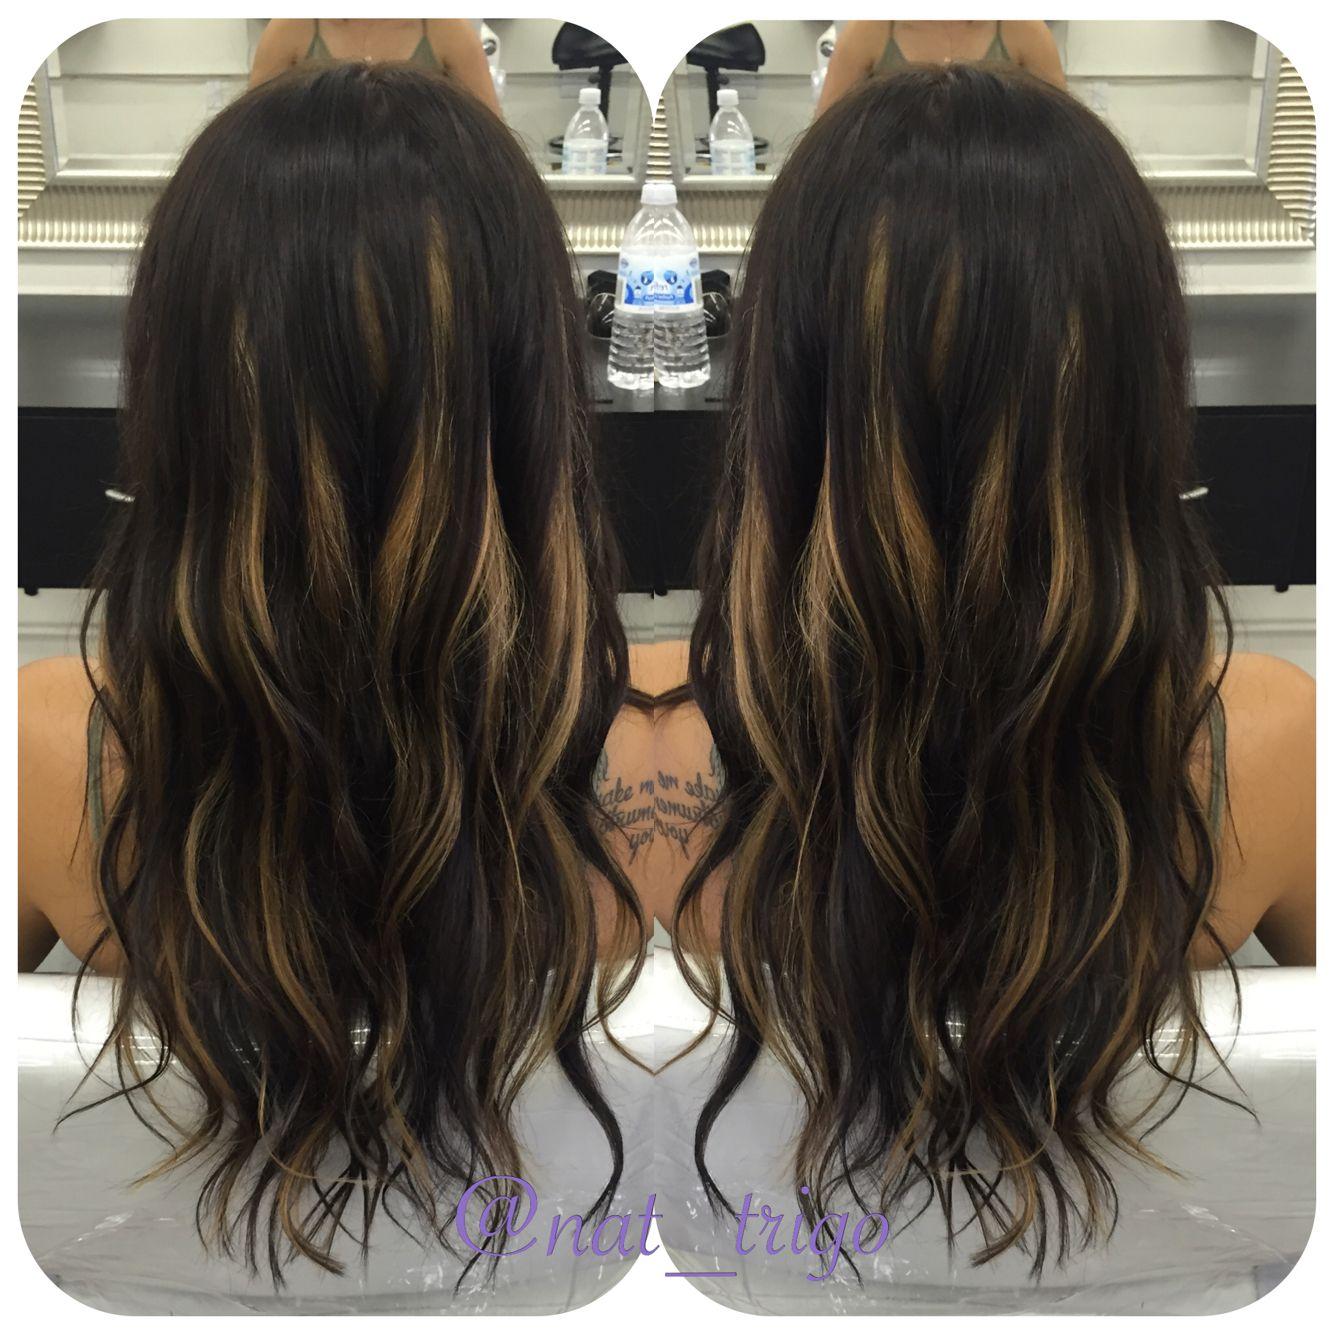 Peekaboo Highlights Peekaboo Hair Hairstylist Hair By Natalie